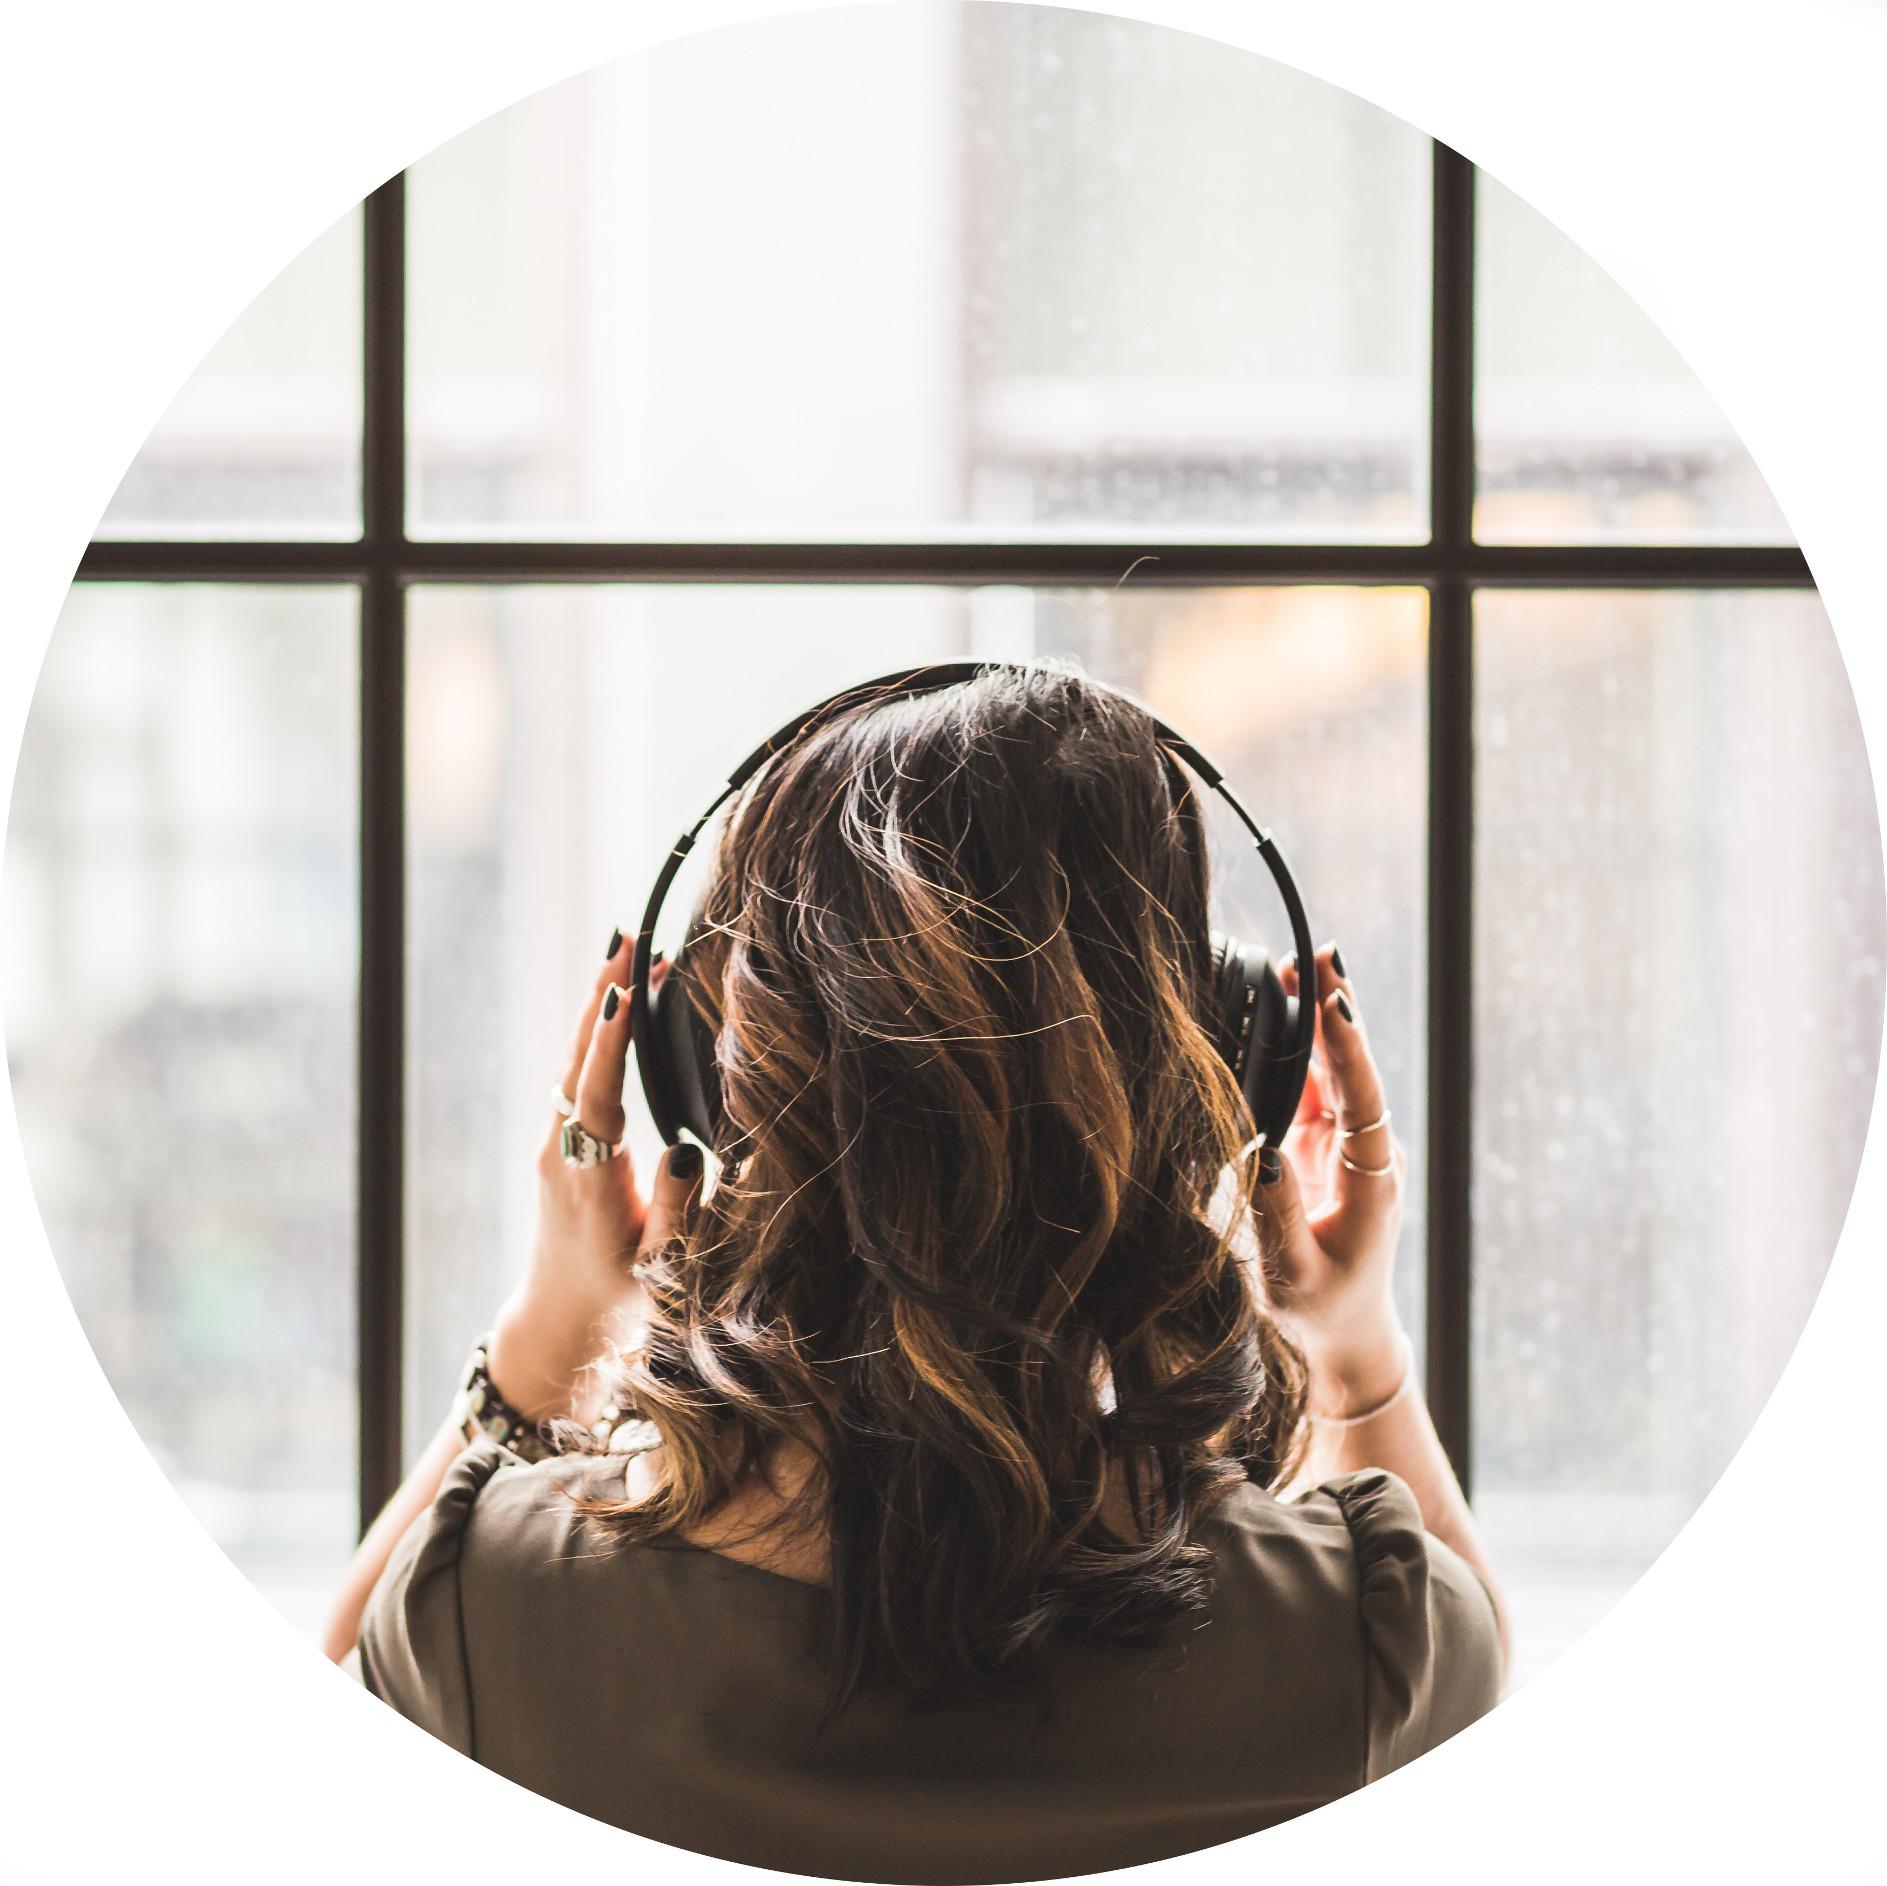 podcast-serendipity